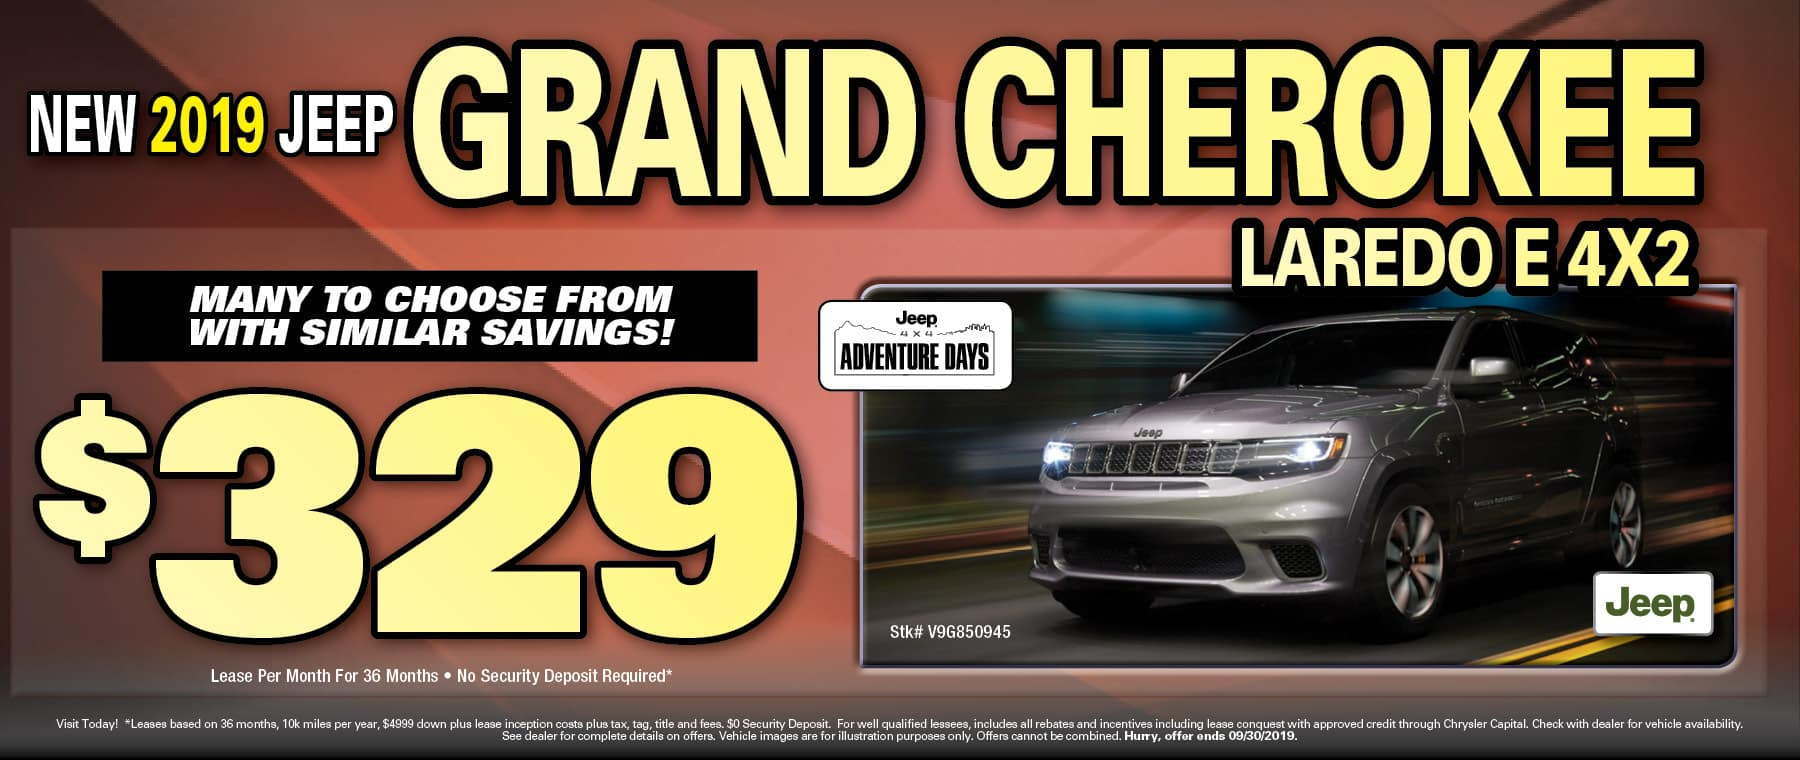 Grand Cherokee $329 Lea